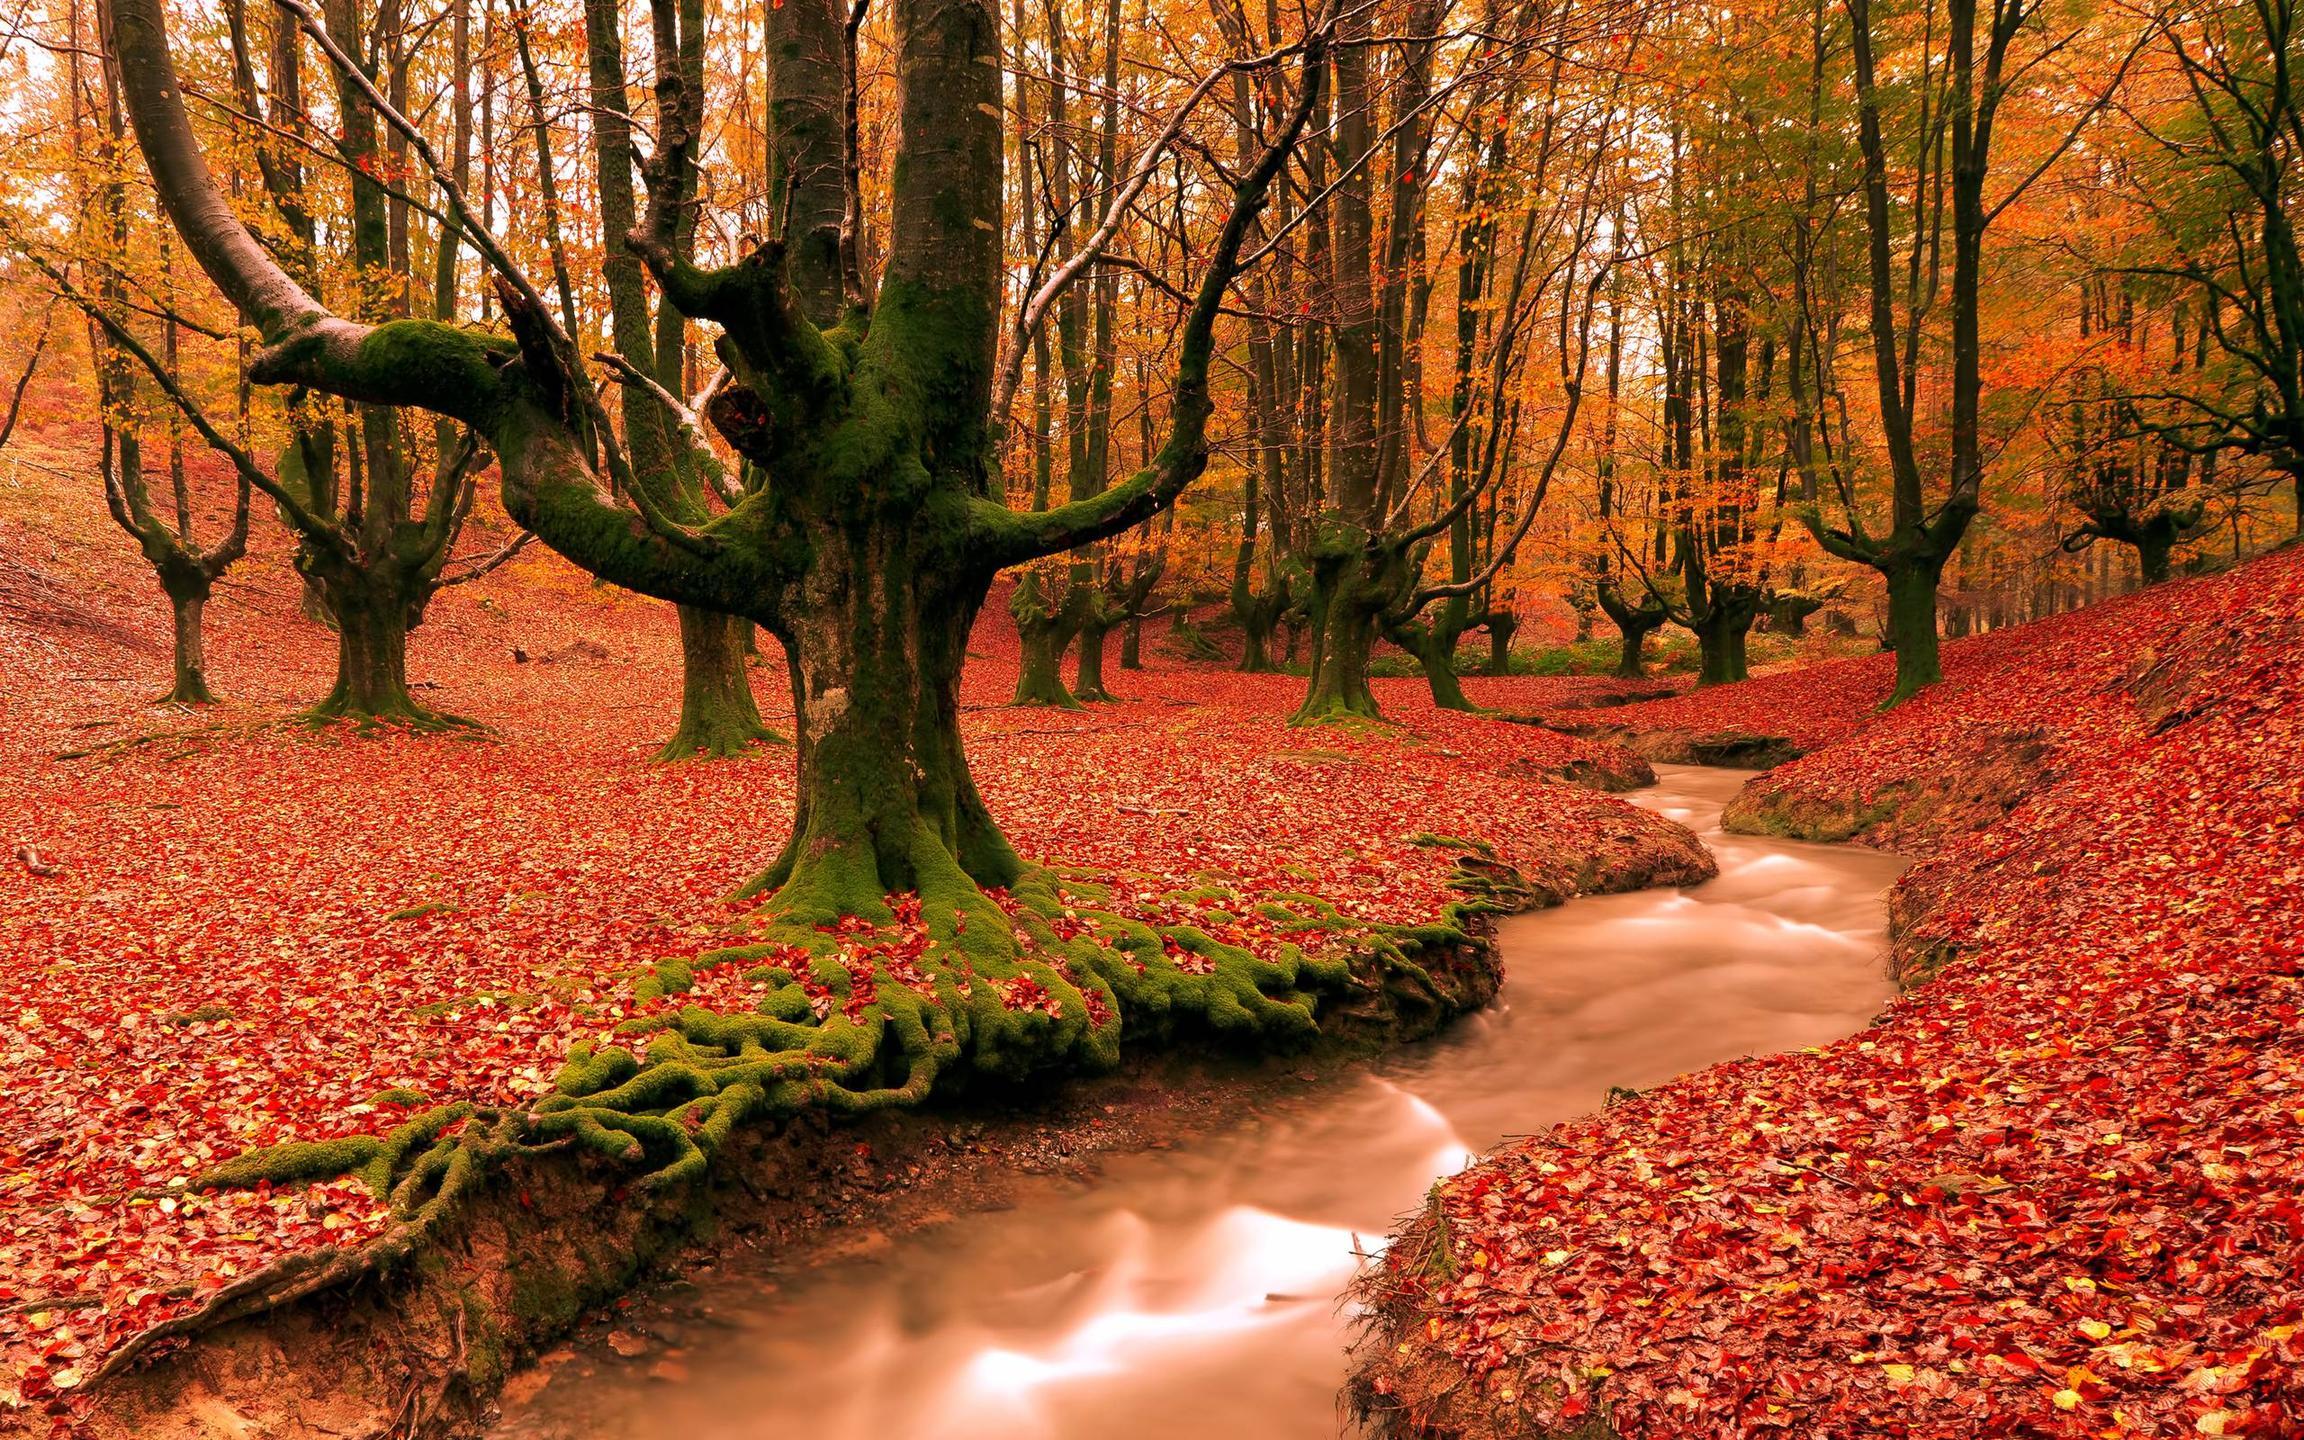 autumn backgrounds desktop pixelstalk autumn wallpapers hd desktop backgrounds images and pictures 2304x1440